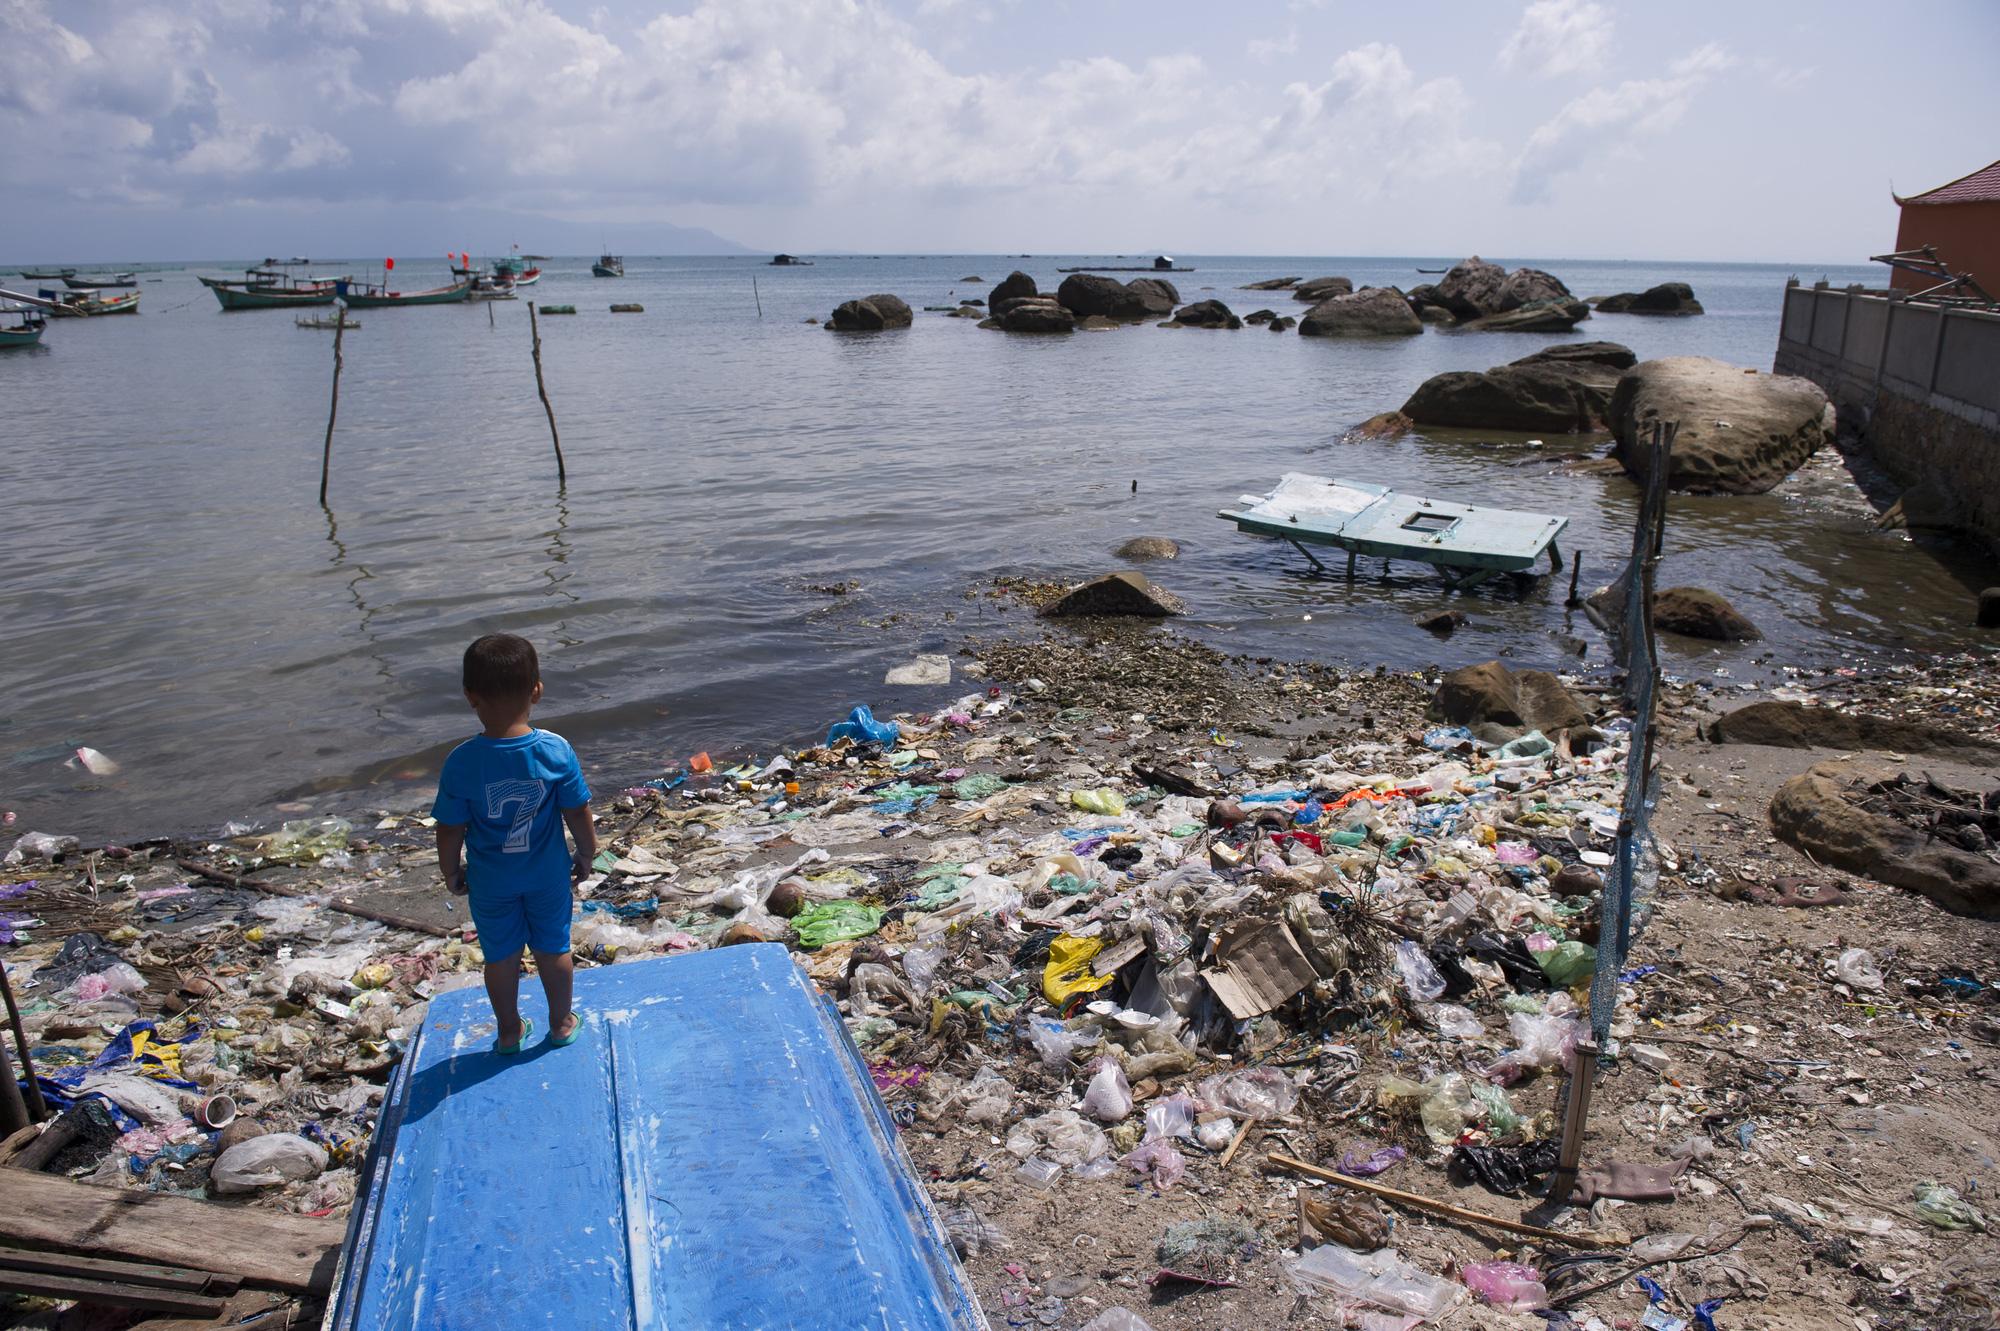 Vietnam's 'pearl island' Phu Quoc faces severe trash crisis